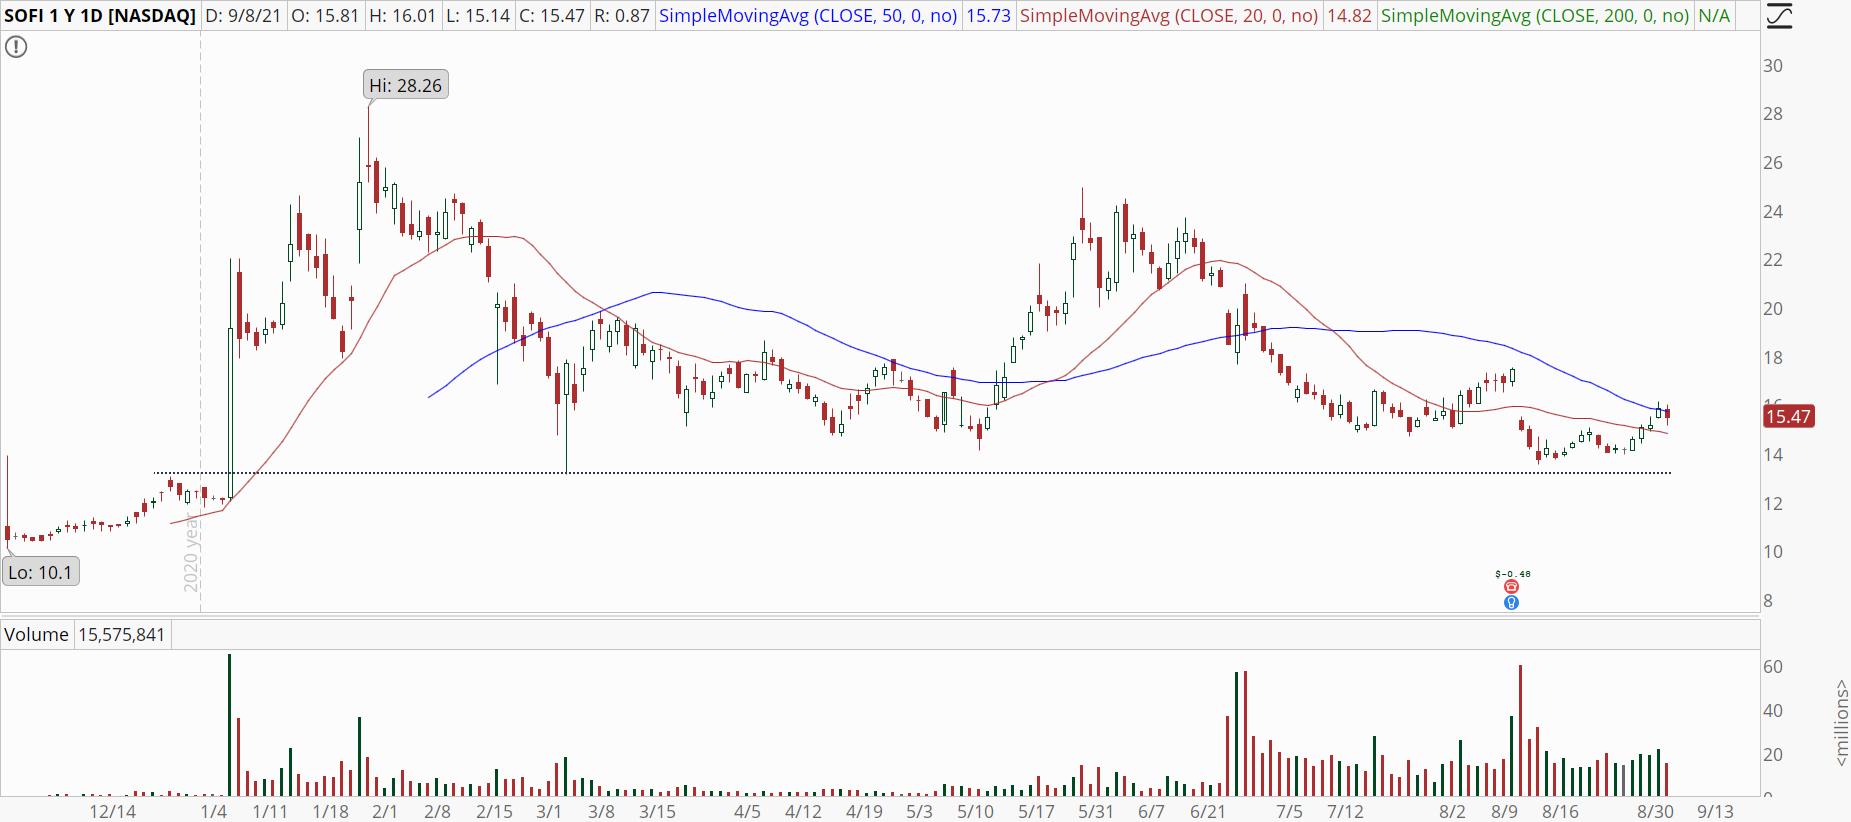 Sofi Technologies (SOFI) stock chart with 50-MA test.